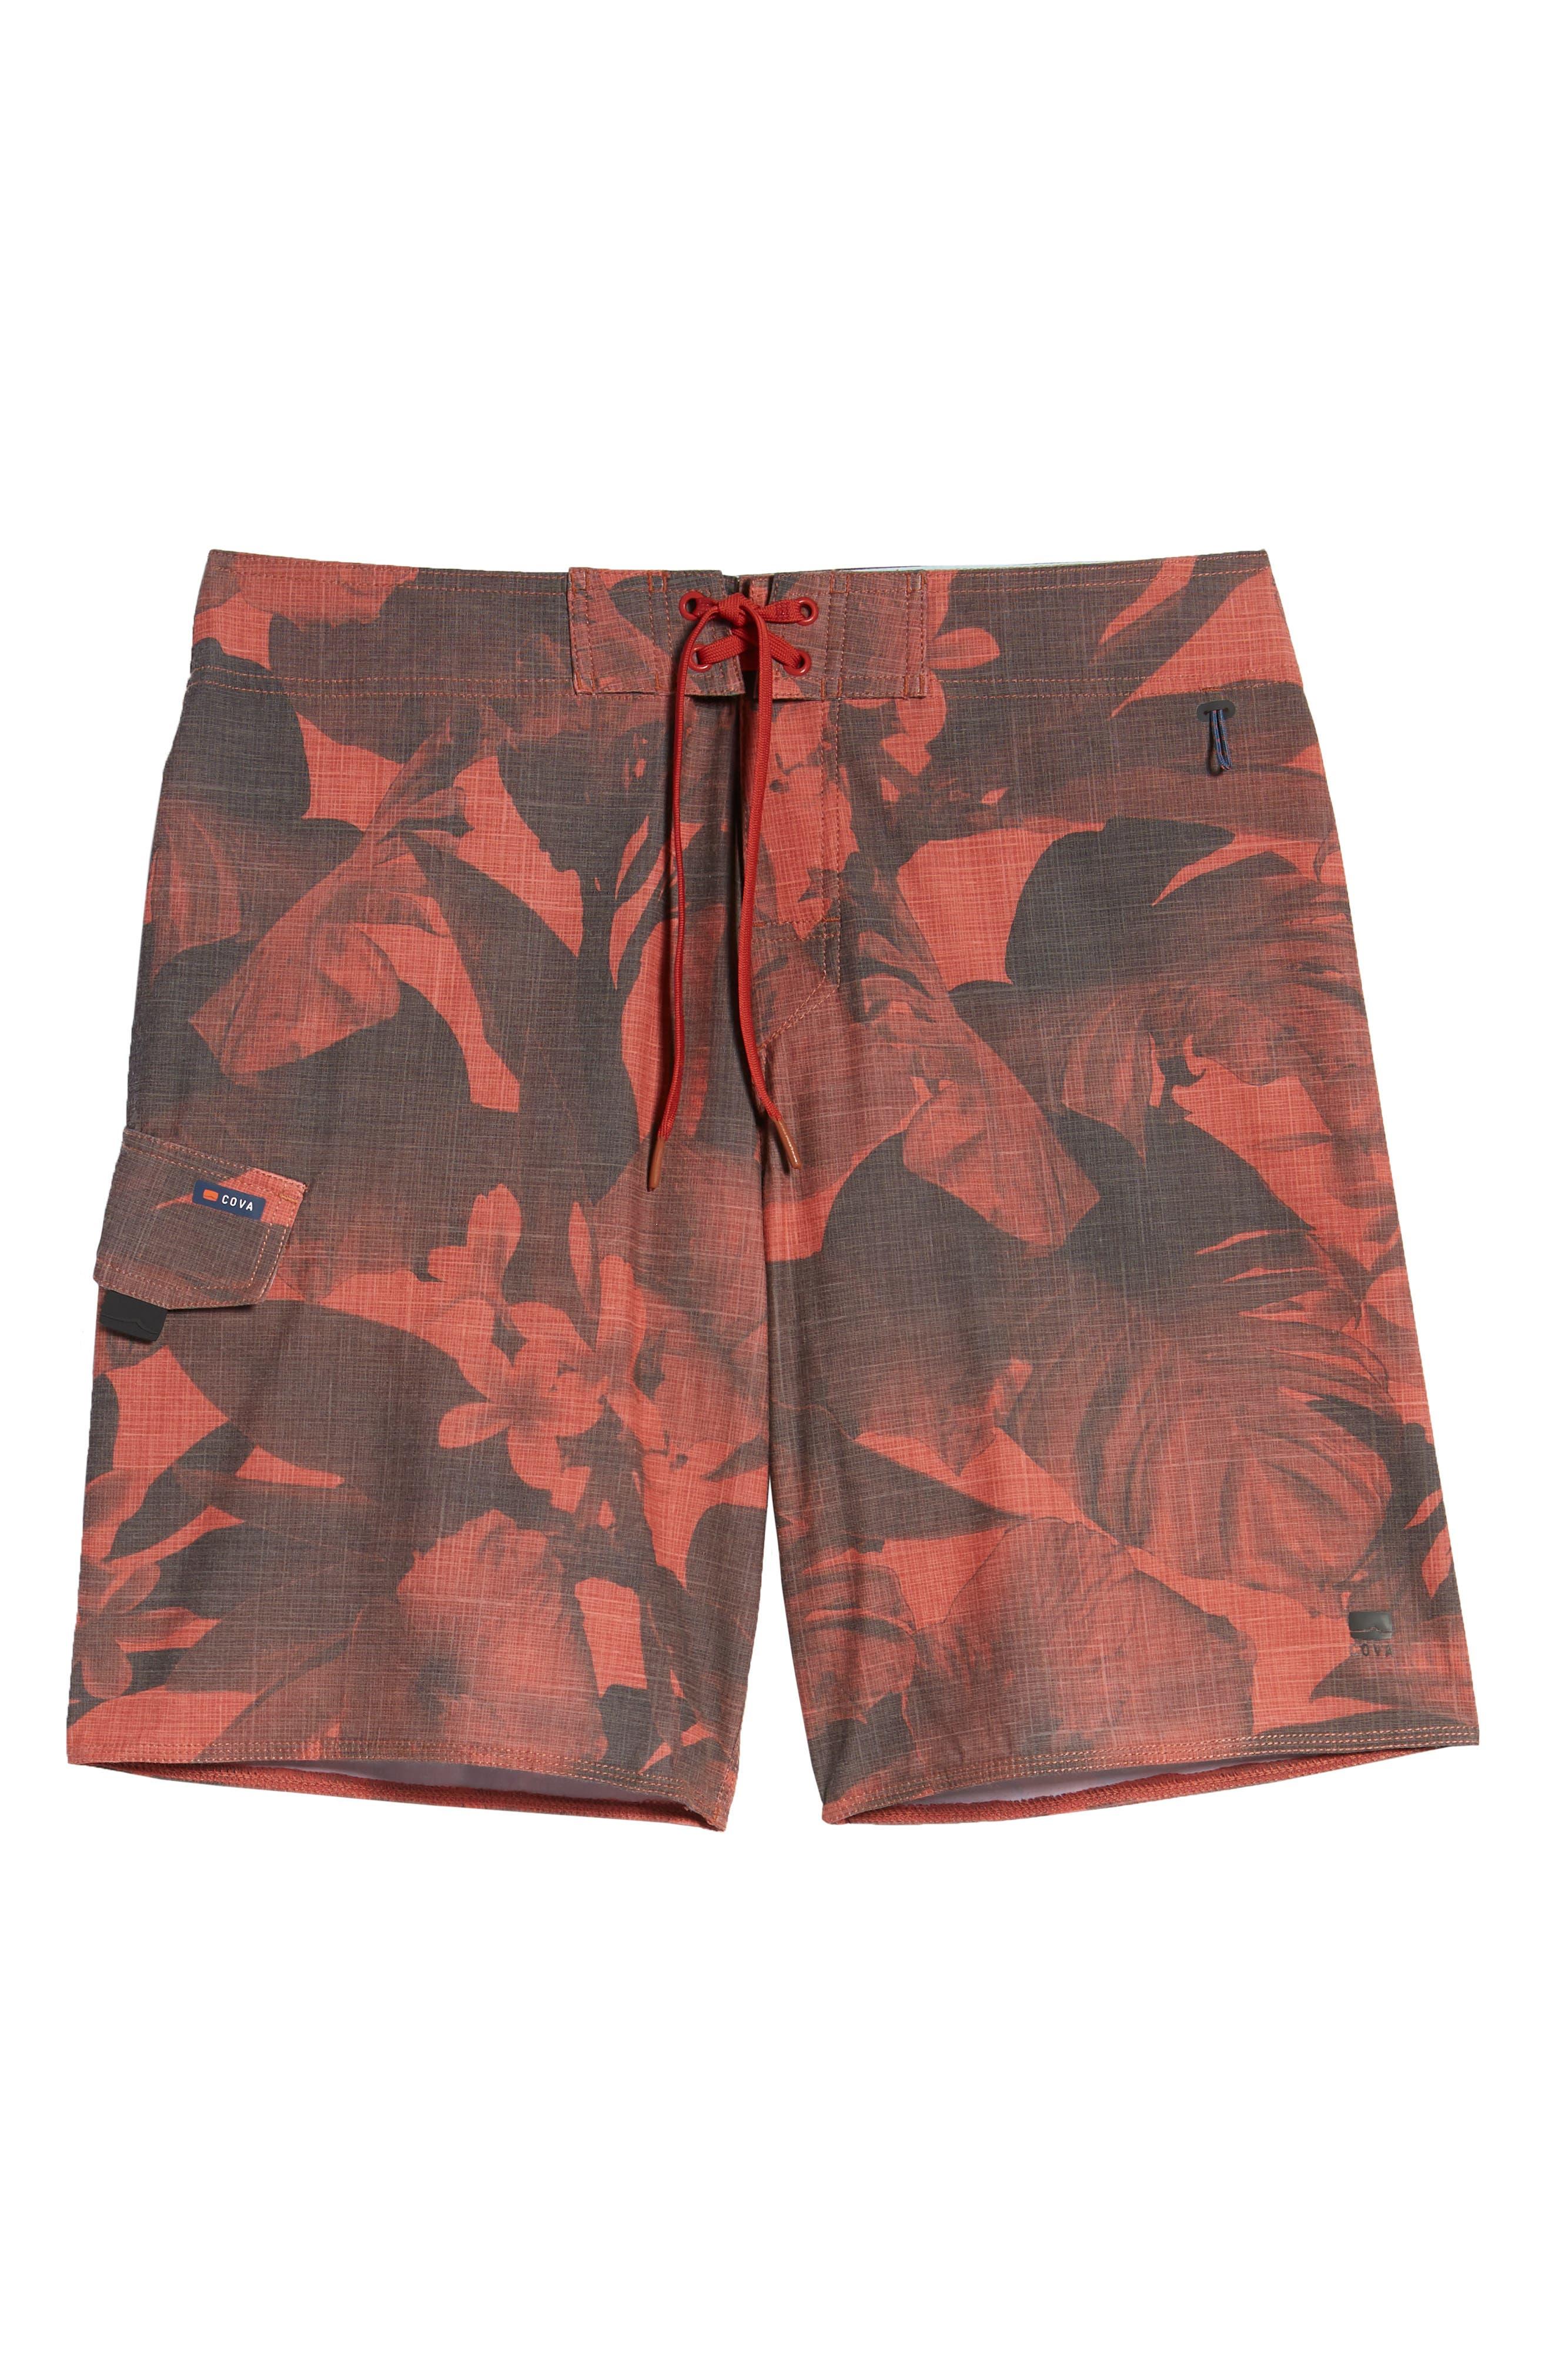 COVA,                             Regular Fit Lazy Daze Board Shorts,                             Alternate thumbnail 6, color,                             602